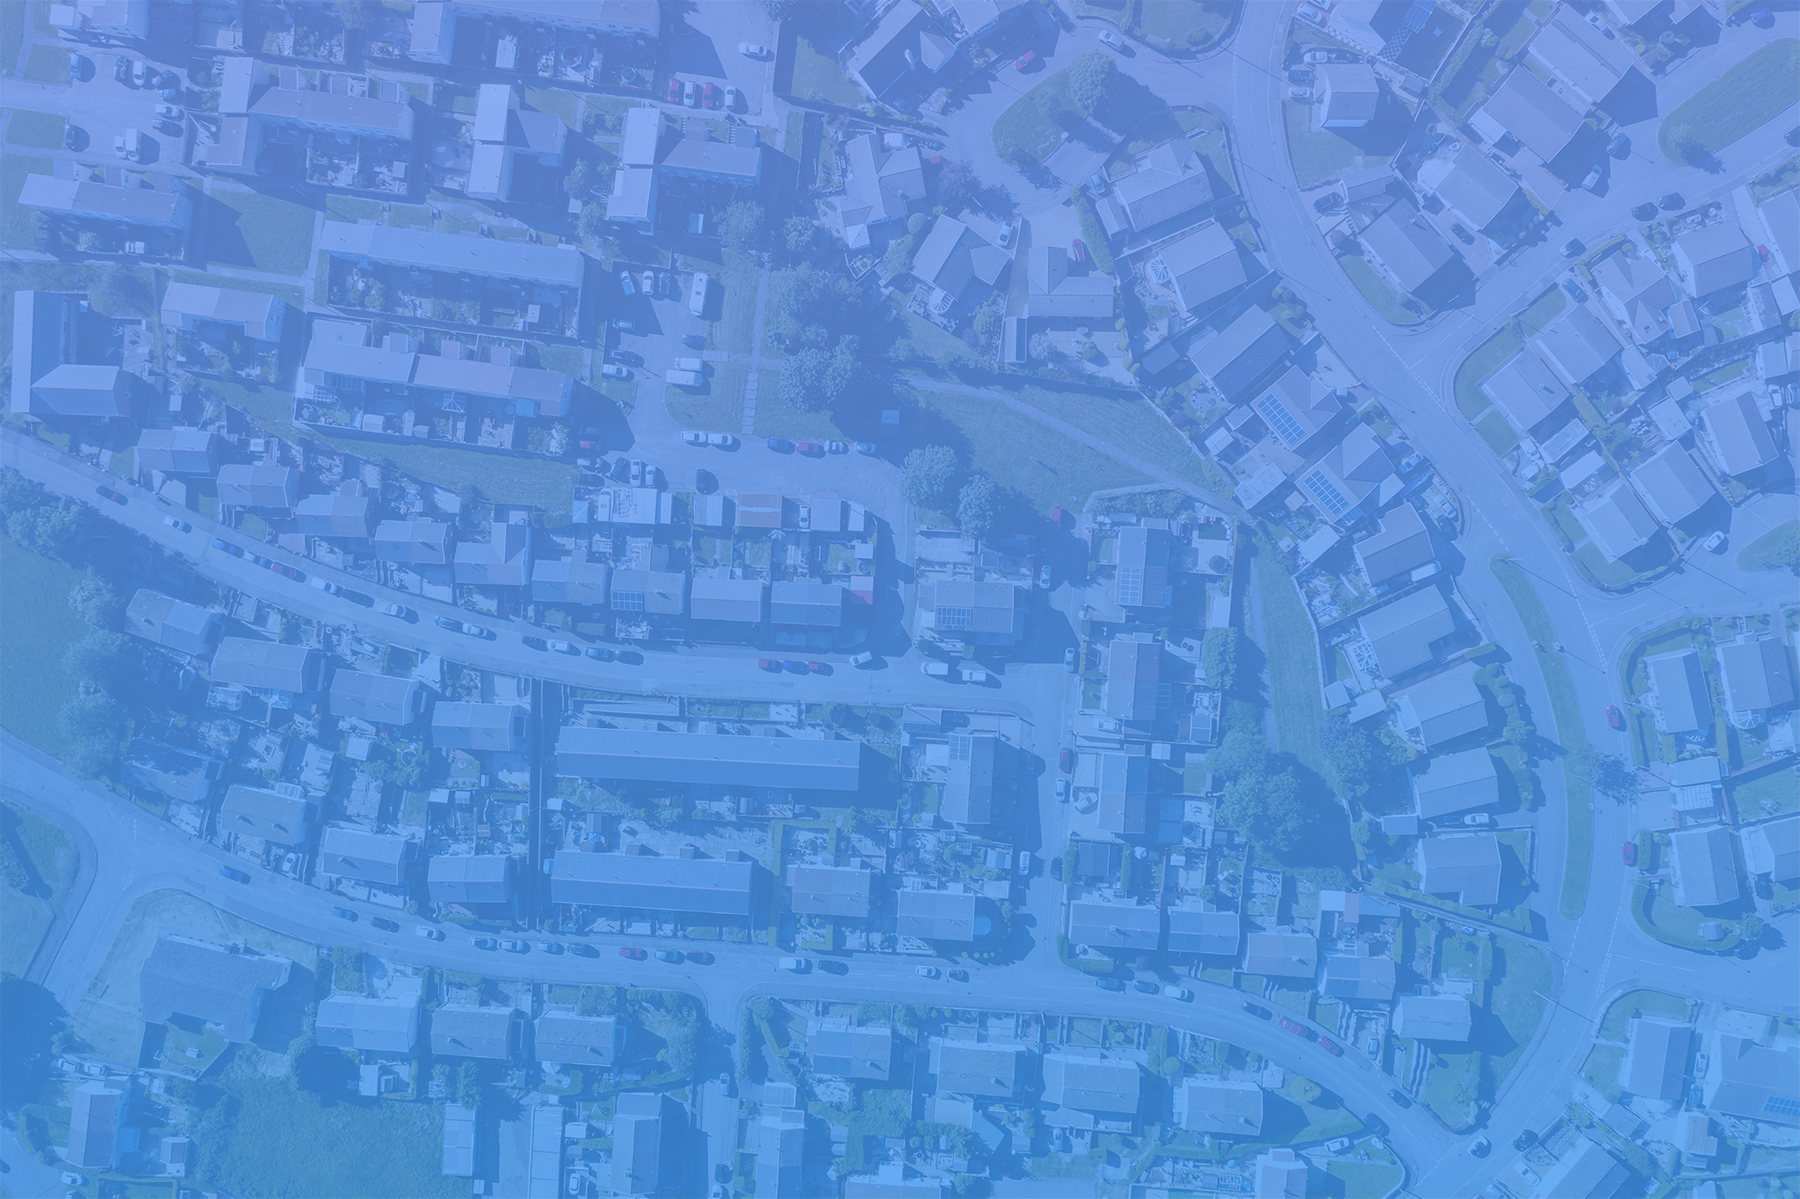 real estate leads birds eye view neighborhood blue ovrly sm